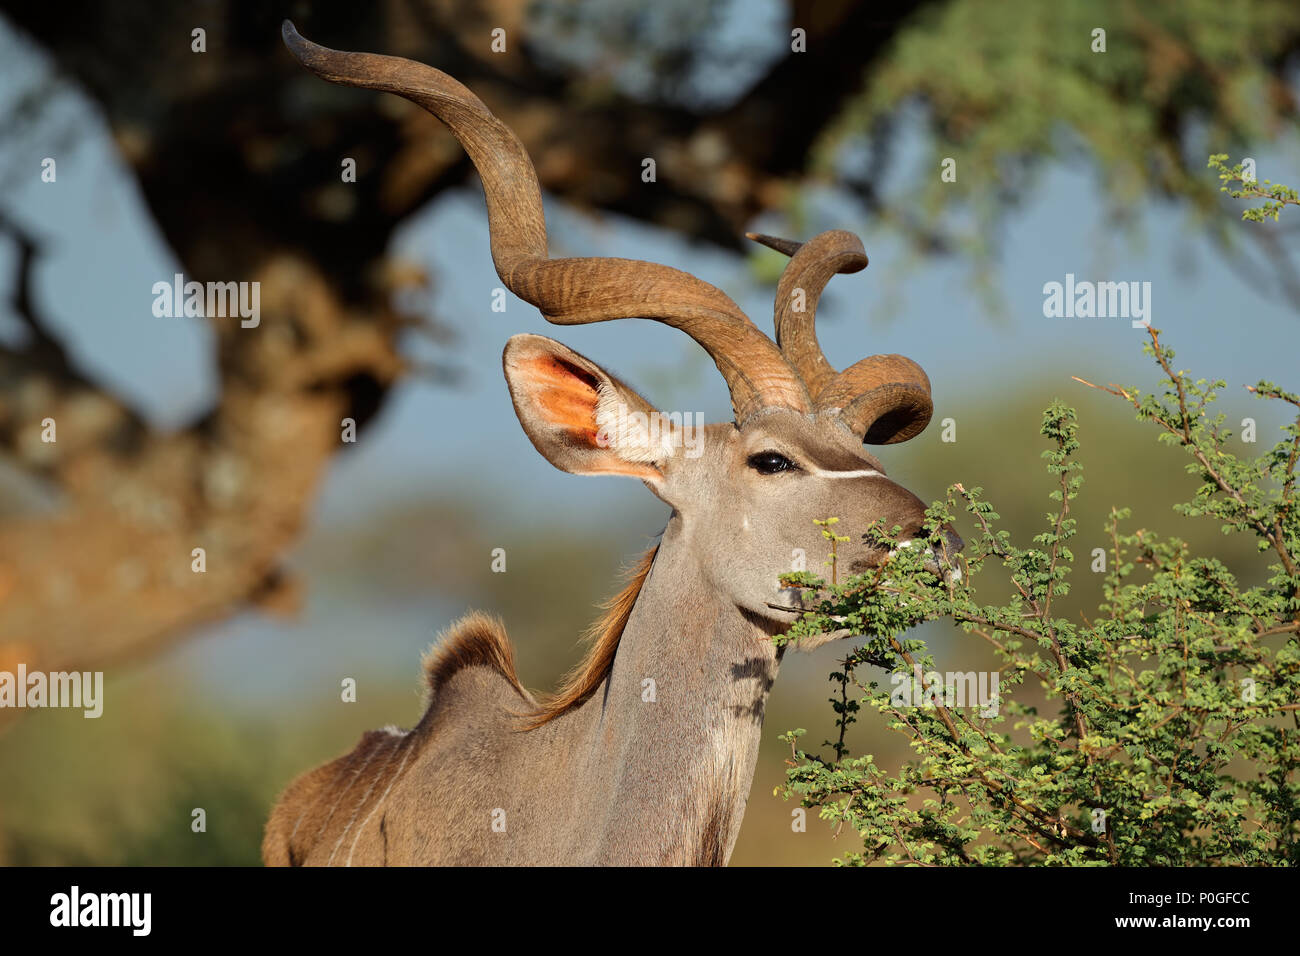 Male kudu antelope (Tragelaphus strepsiceros) feeding in natural habitat, South Africa Stock Photo